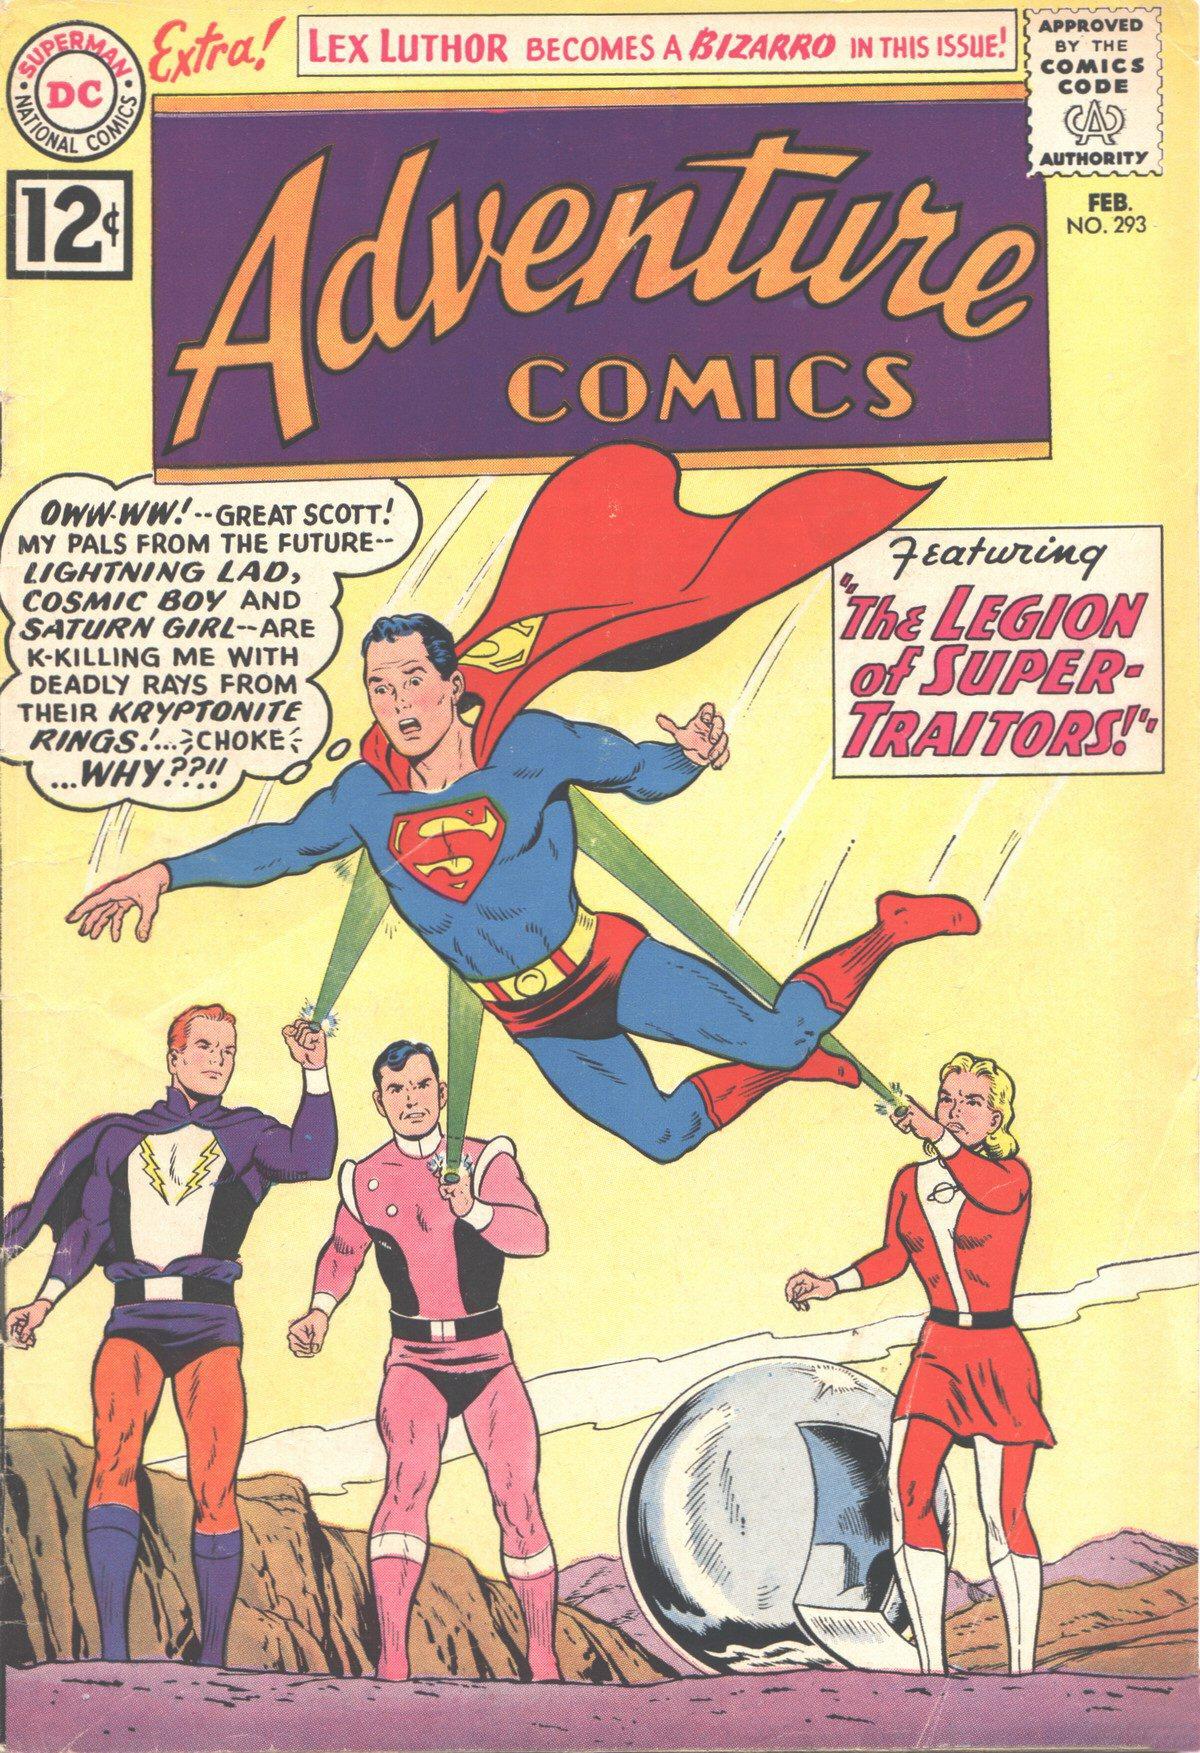 Read online Adventure Comics (1938) comic -  Issue #293 - 1